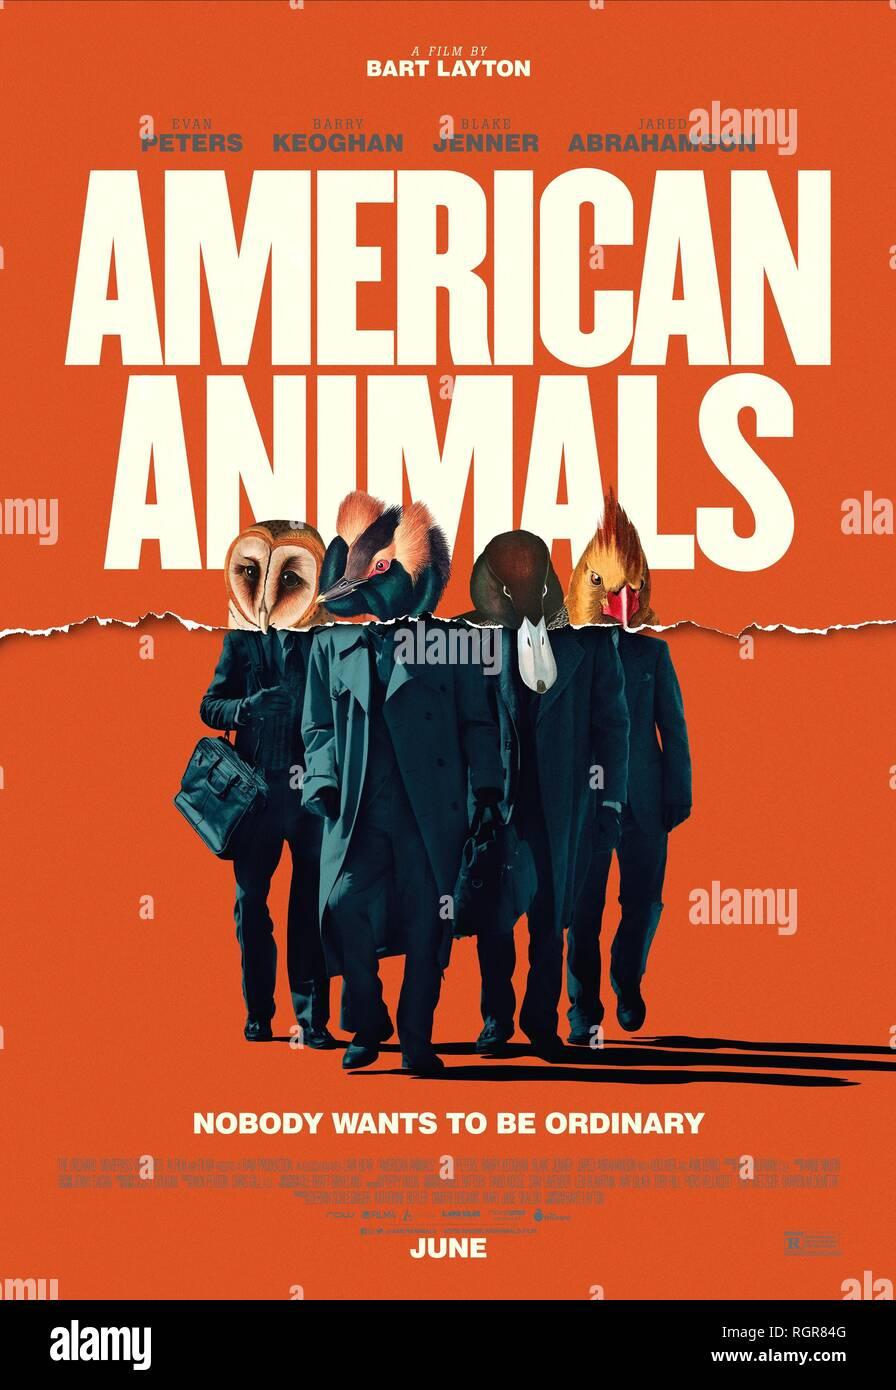 MOVIE POSTER AMERICAN ANIMALS (2018) - Stock Image